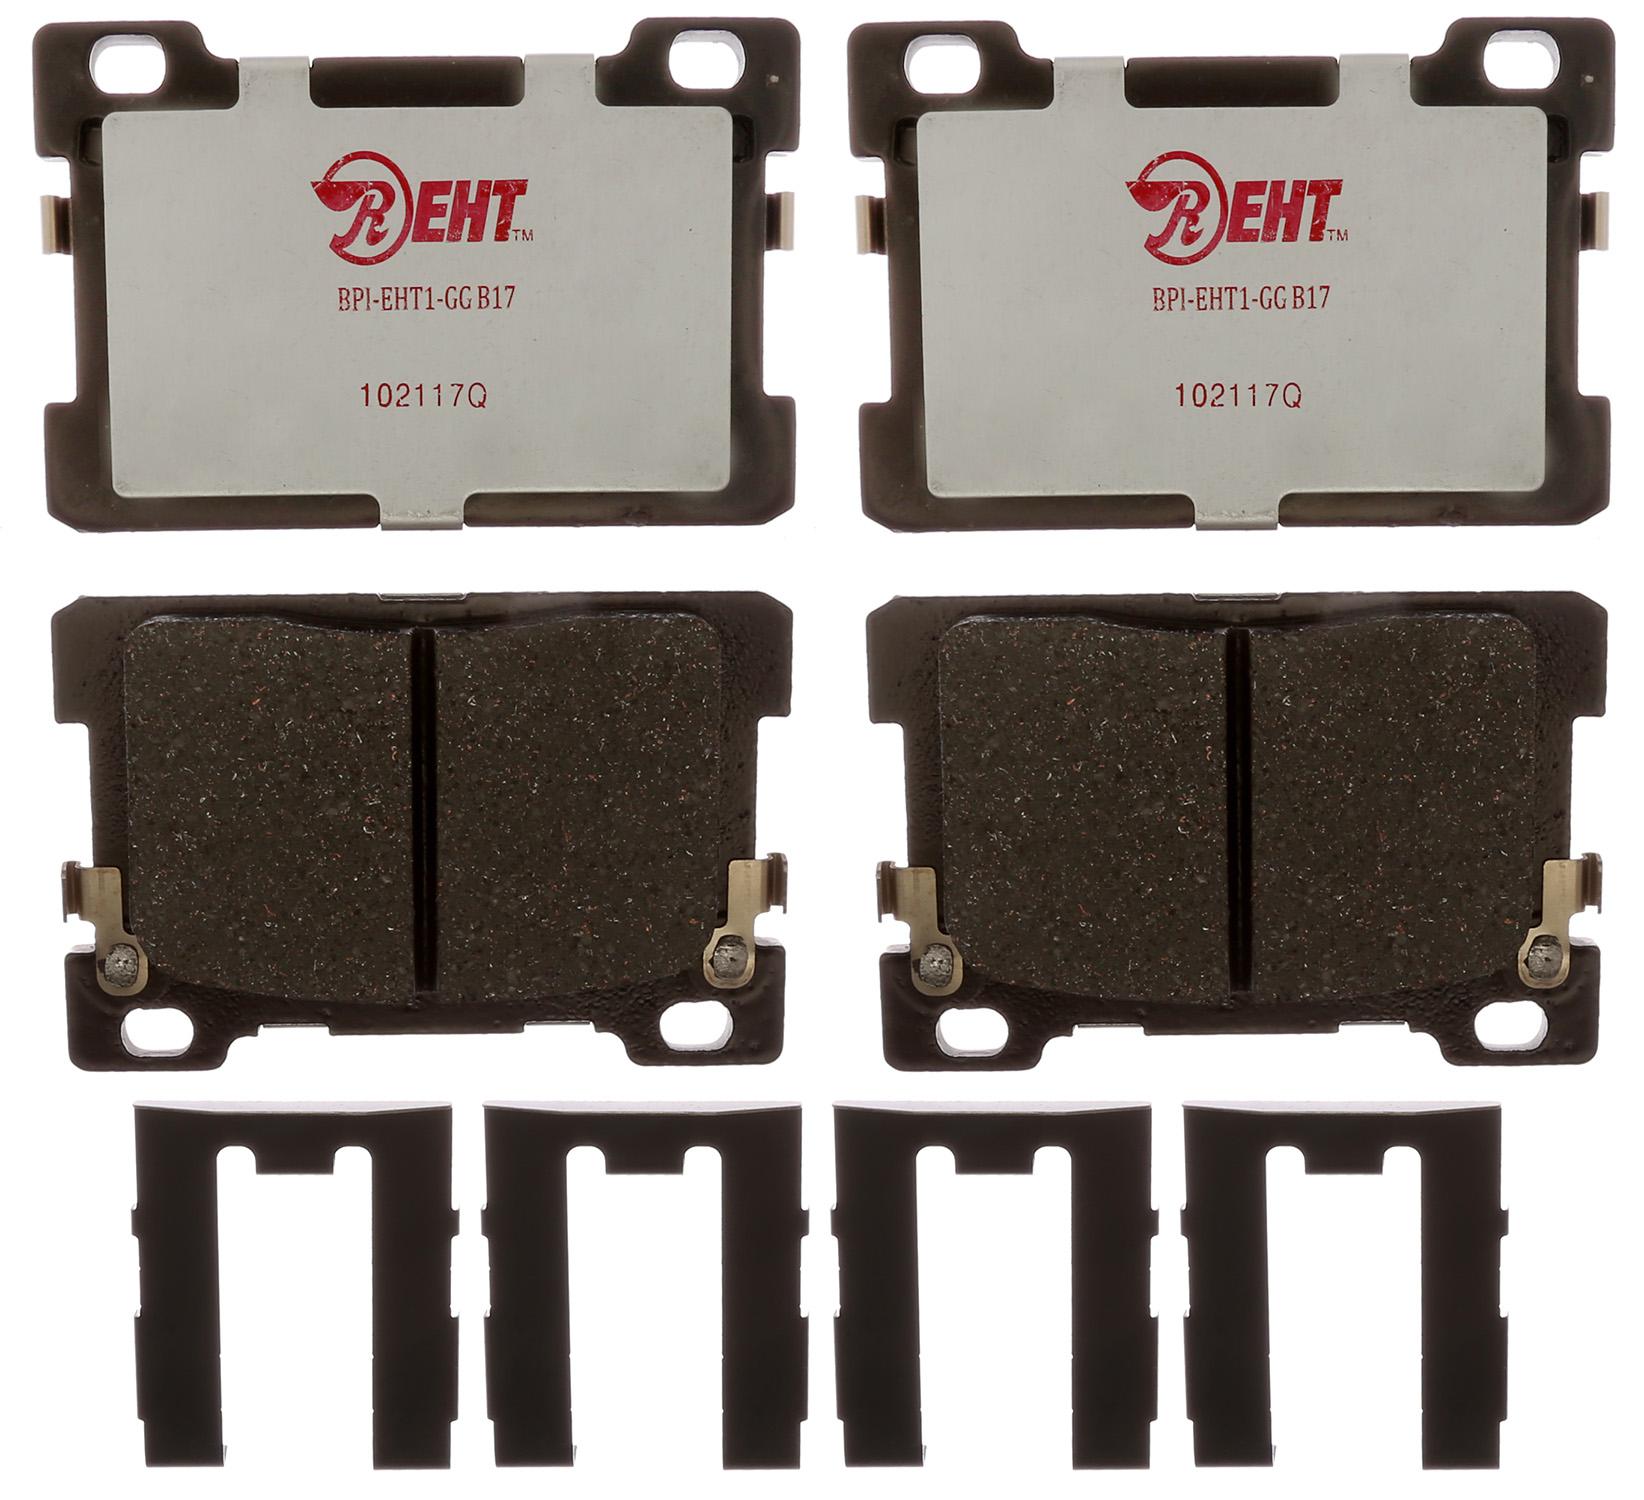 Raybestos Brakes EHT1976H Brake Pad Enhanced Hybrid Technology OE Replacement; Hybrid; With Mounting Hardware - image 1 de 1